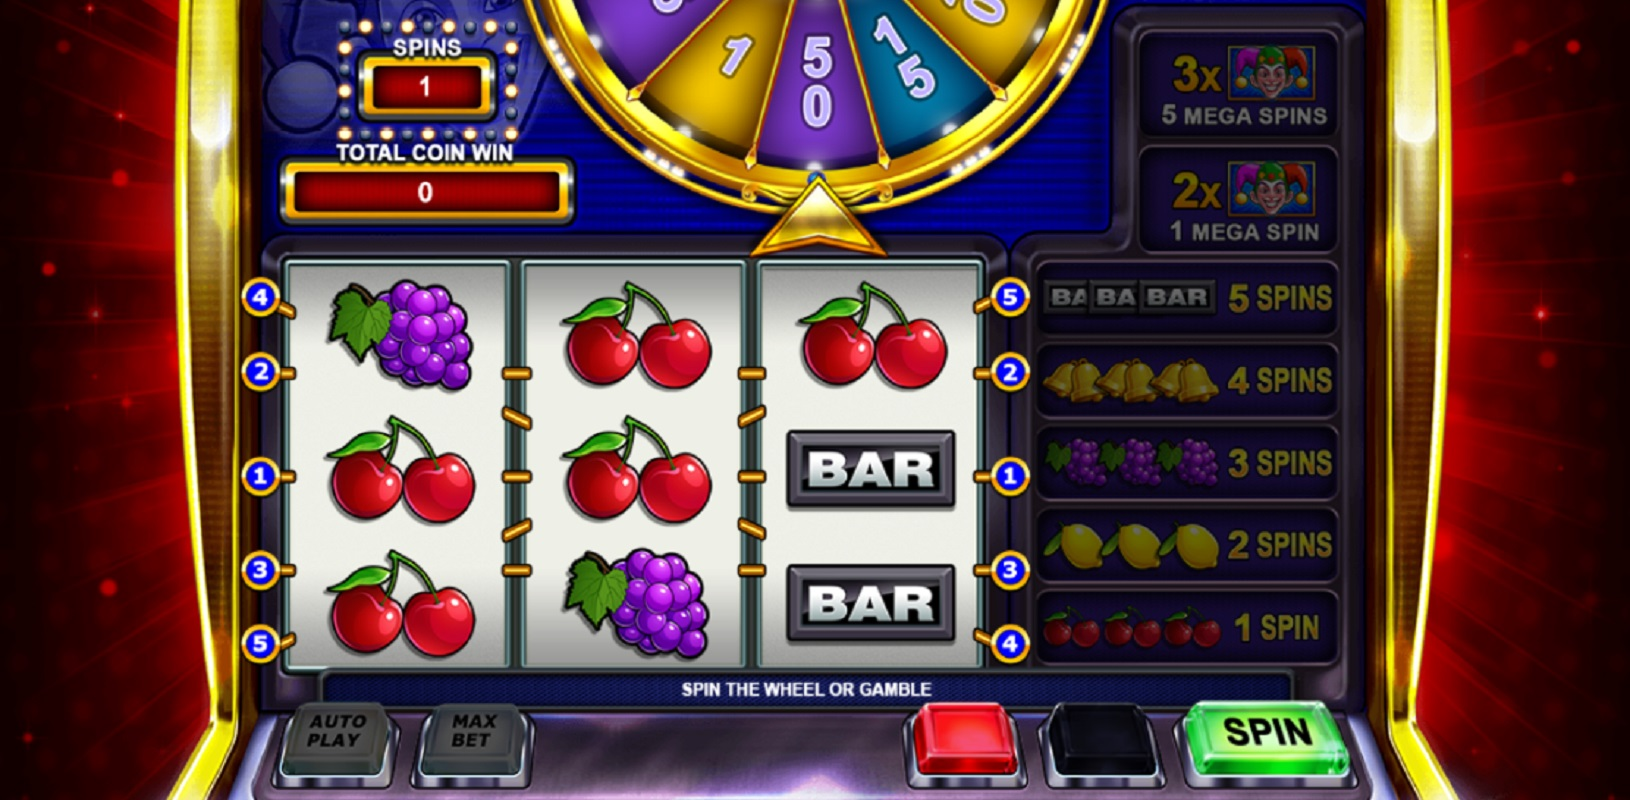 Party poker cash games